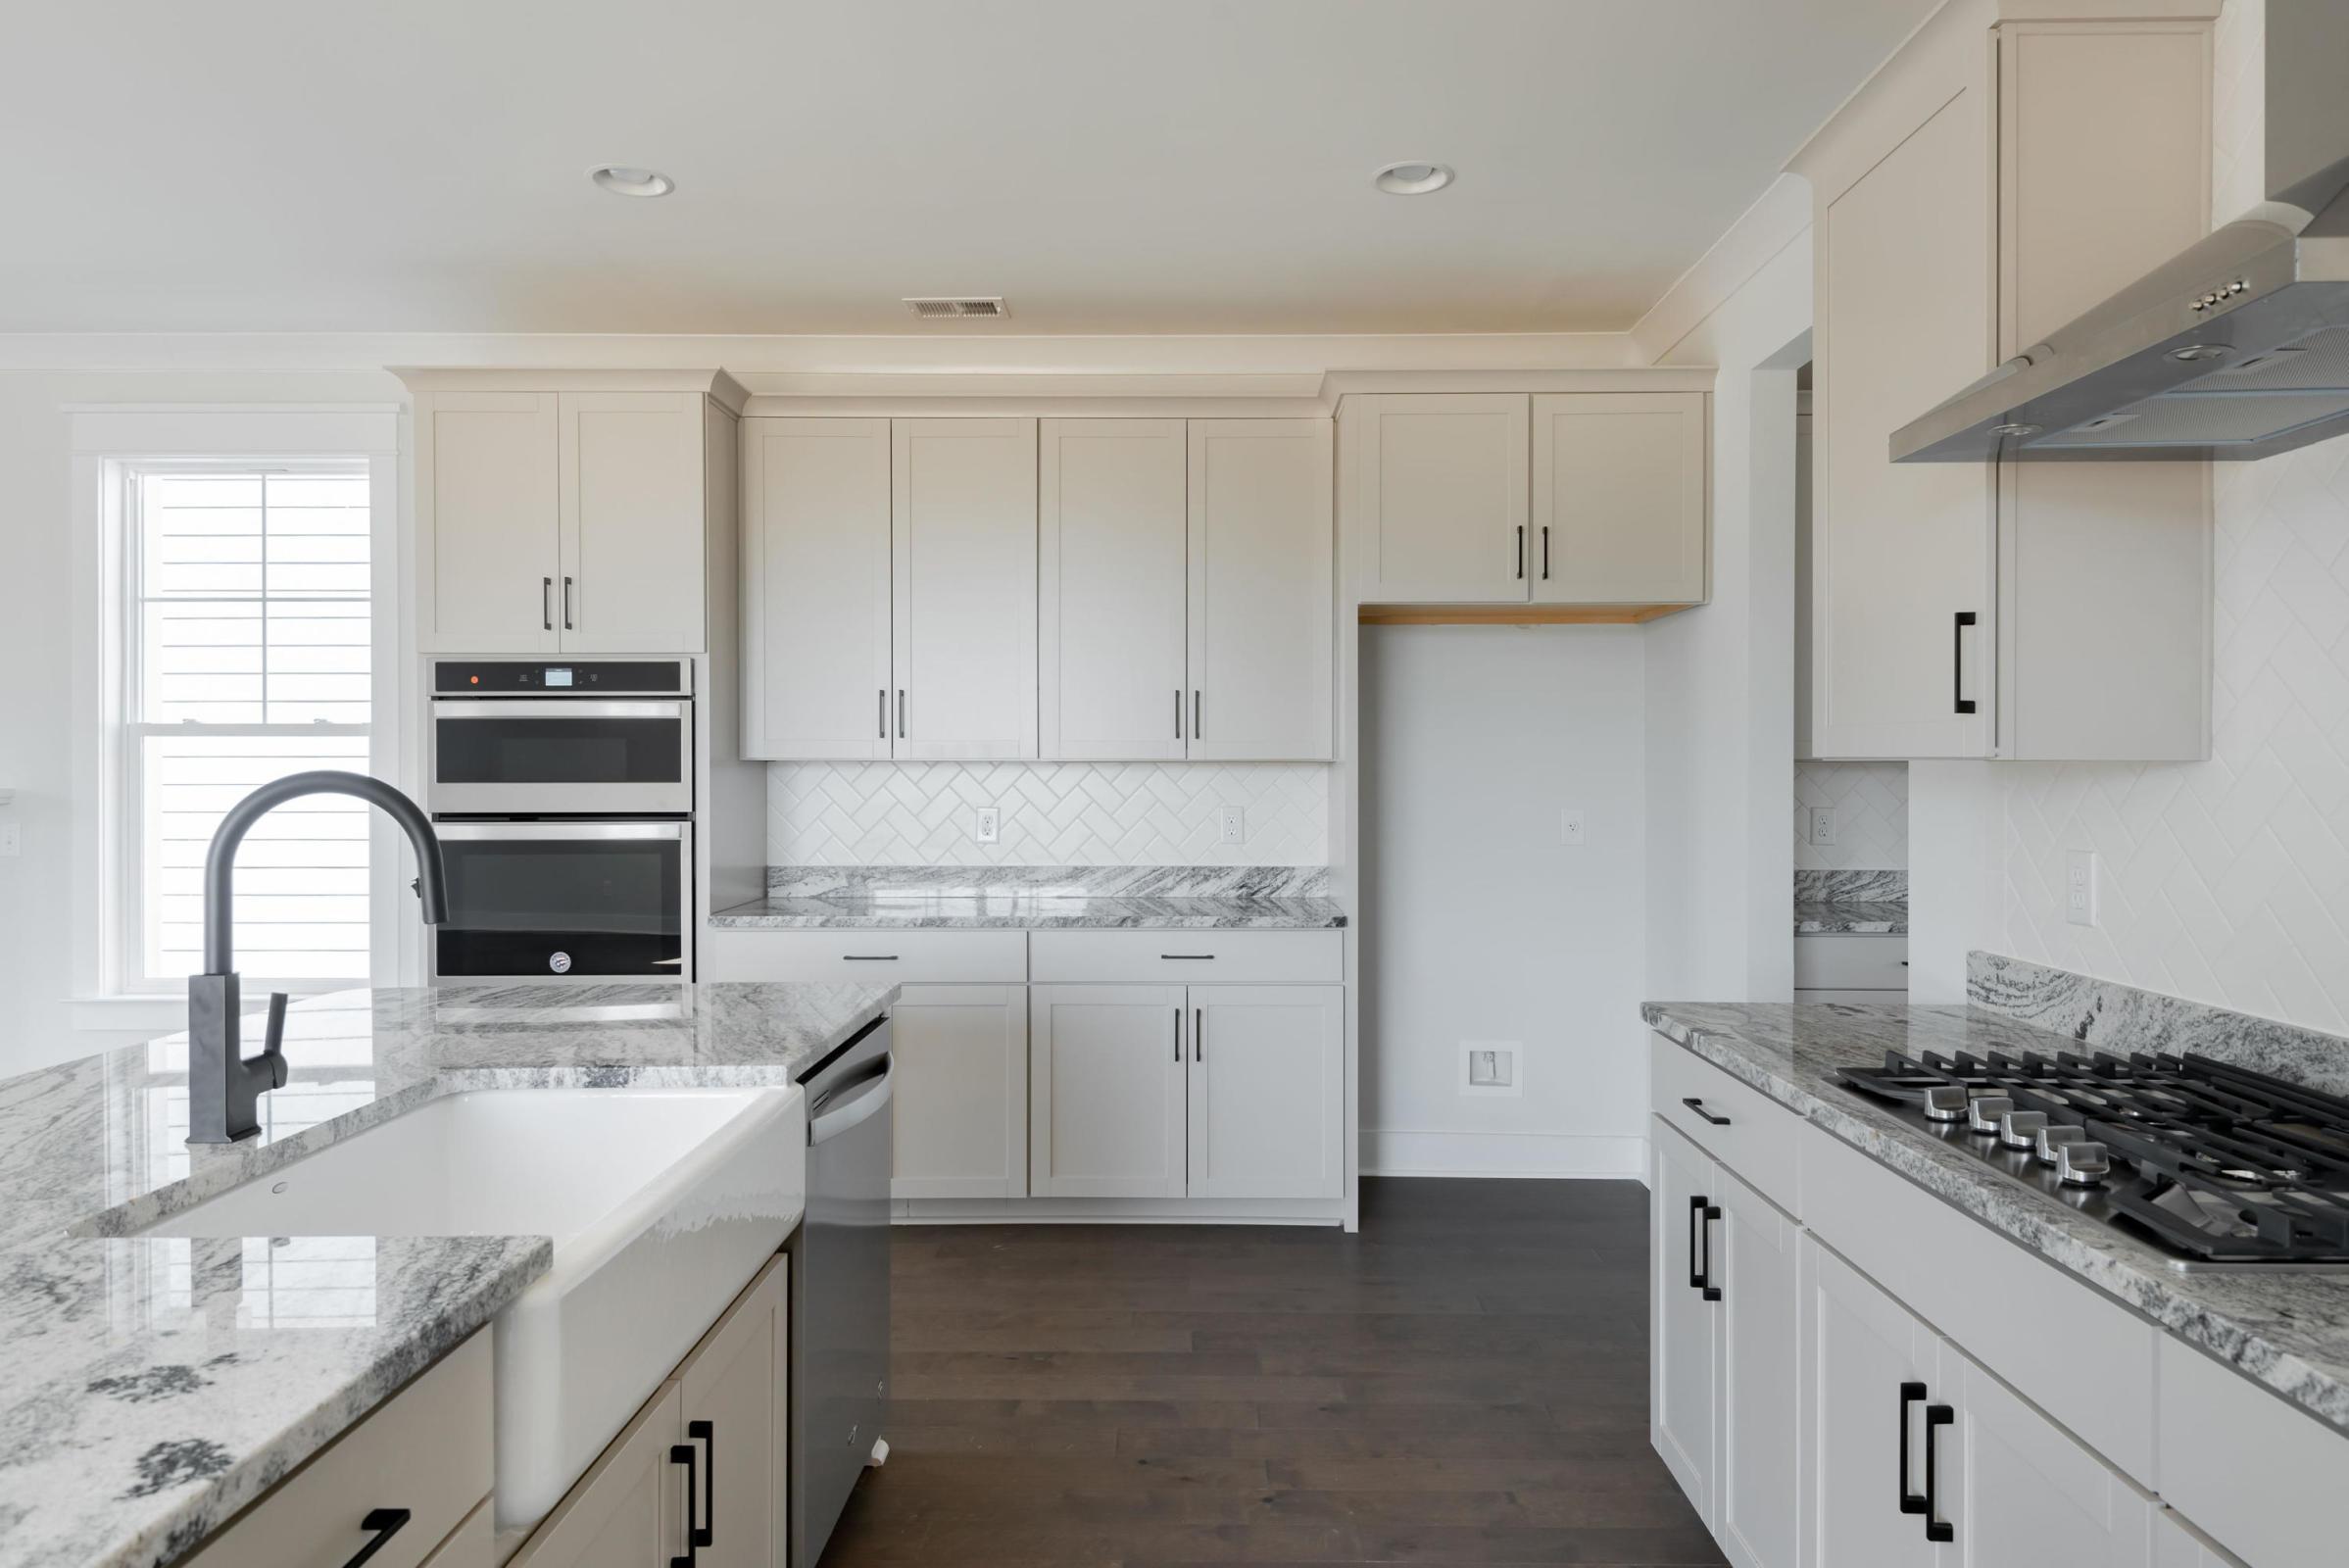 James Island Homes For Sale - 1397 Harbor View, Charleston, SC - 3